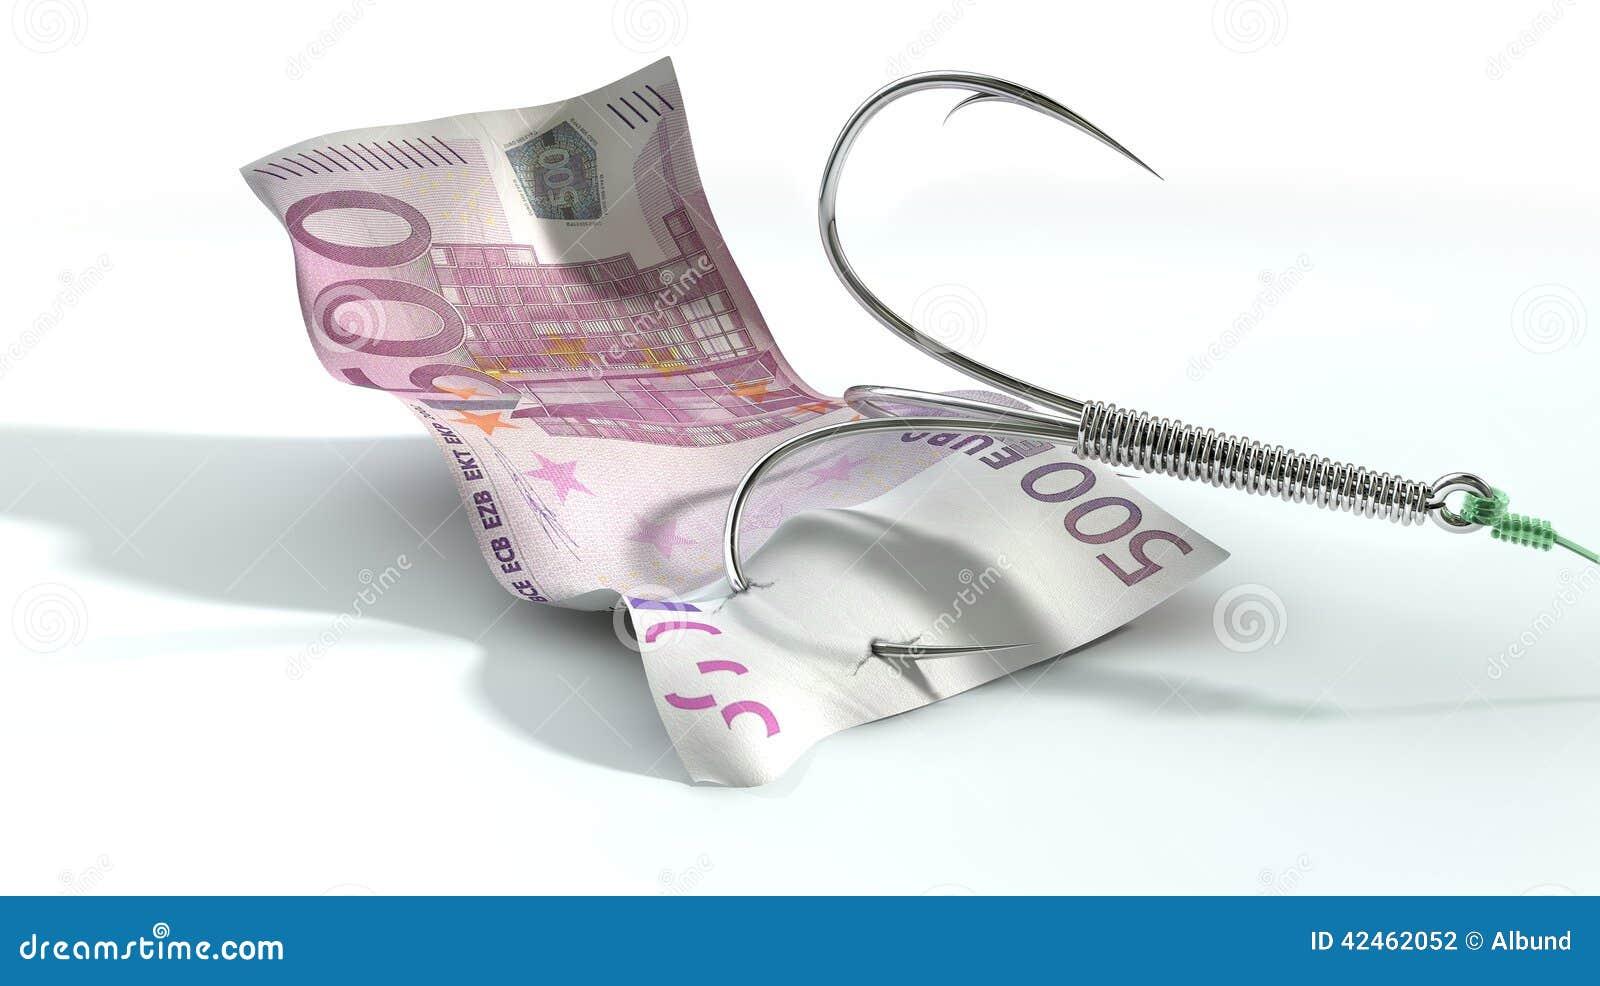 Eurobanknote angelockter Haken